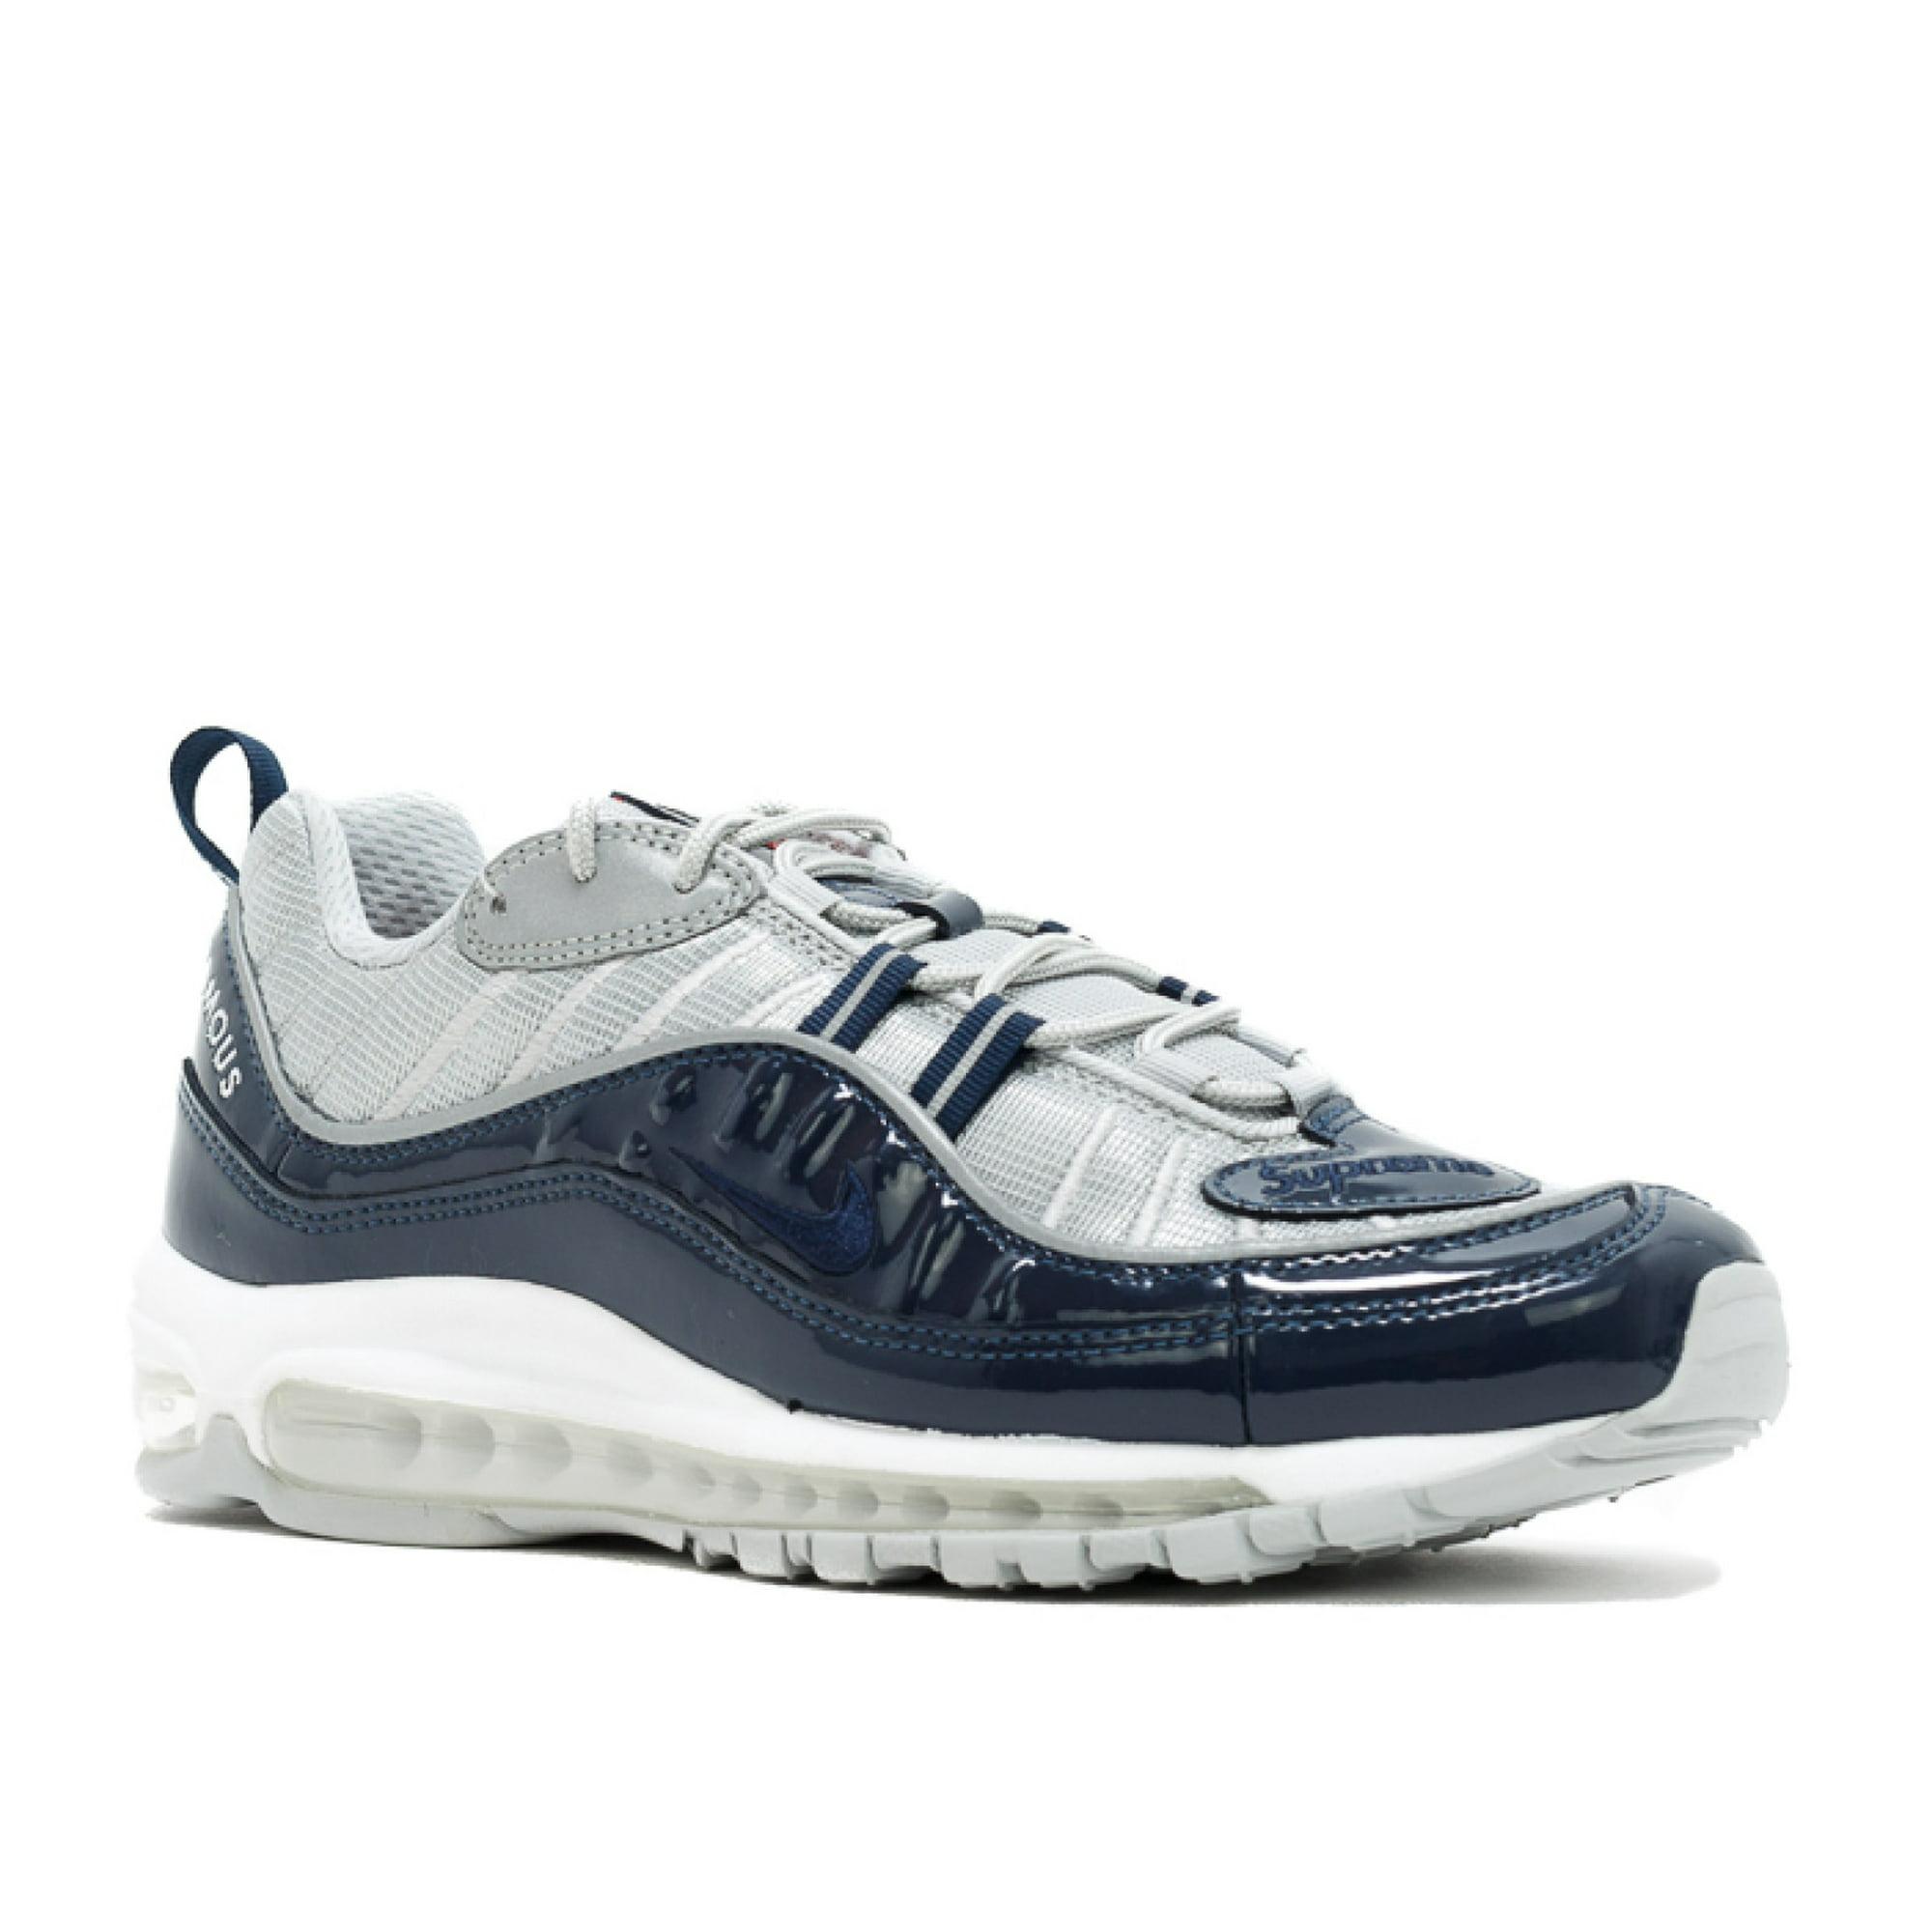 atravesar Simetría segunda mano  Nike - Men - Nike Air Max 98/Supreme 'Supreme98' -844694-400 - Size 8 |  Walmart Canada